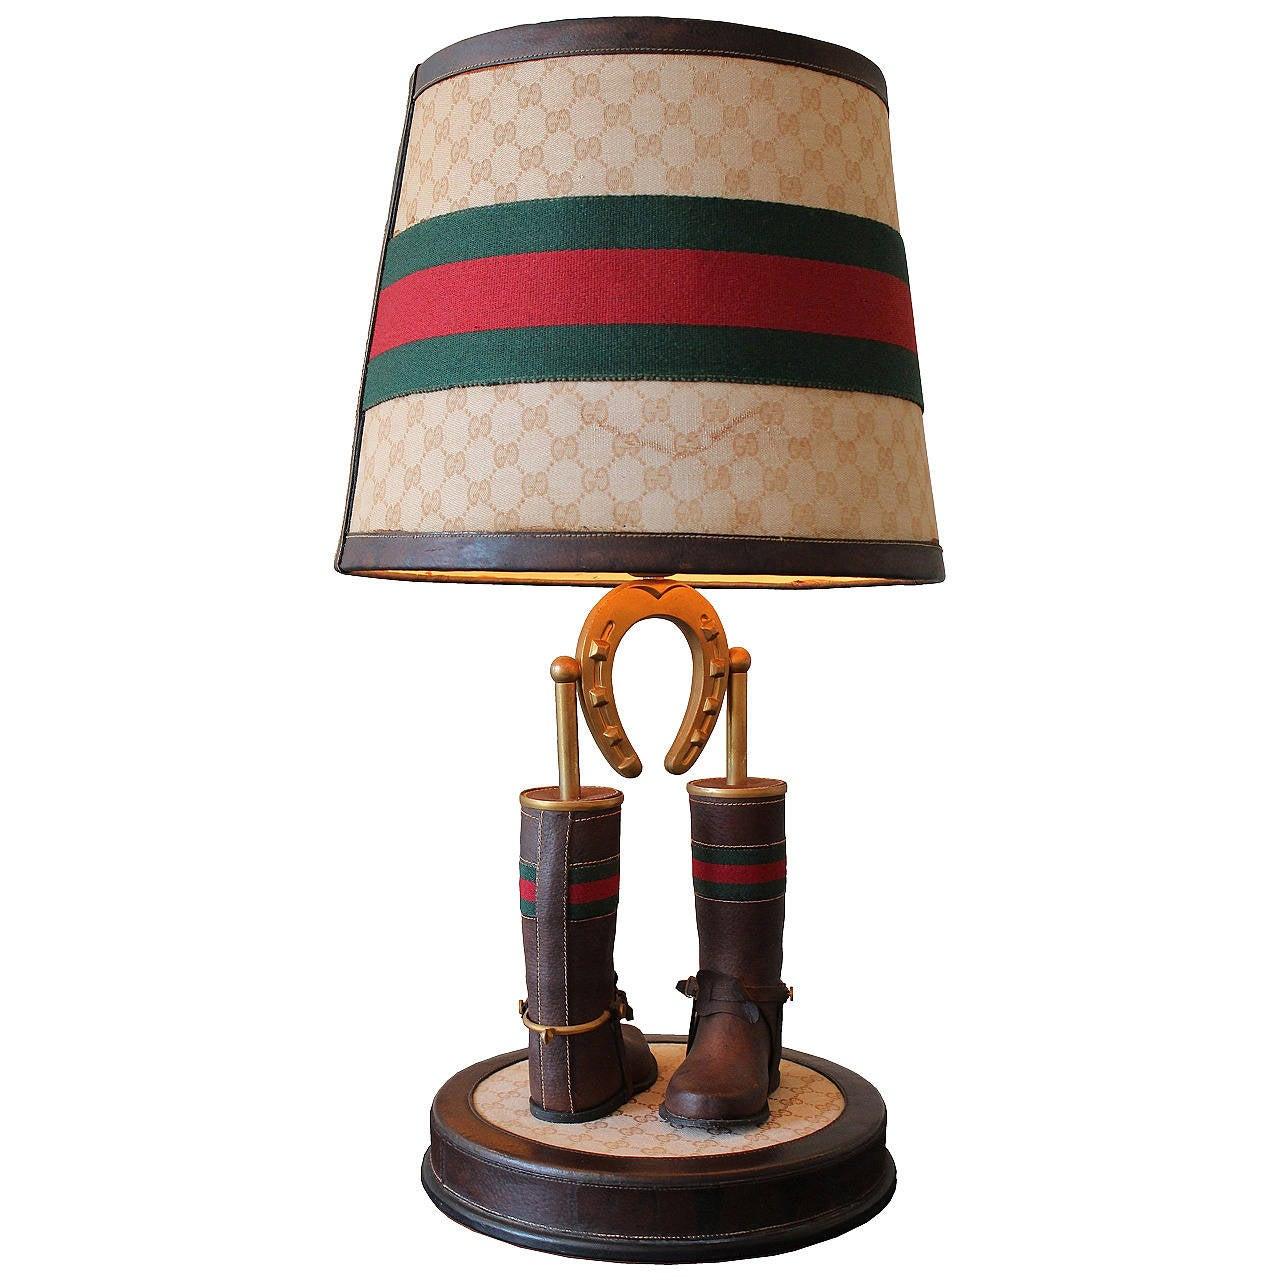 rare table lamp by gucci at 1stdibs